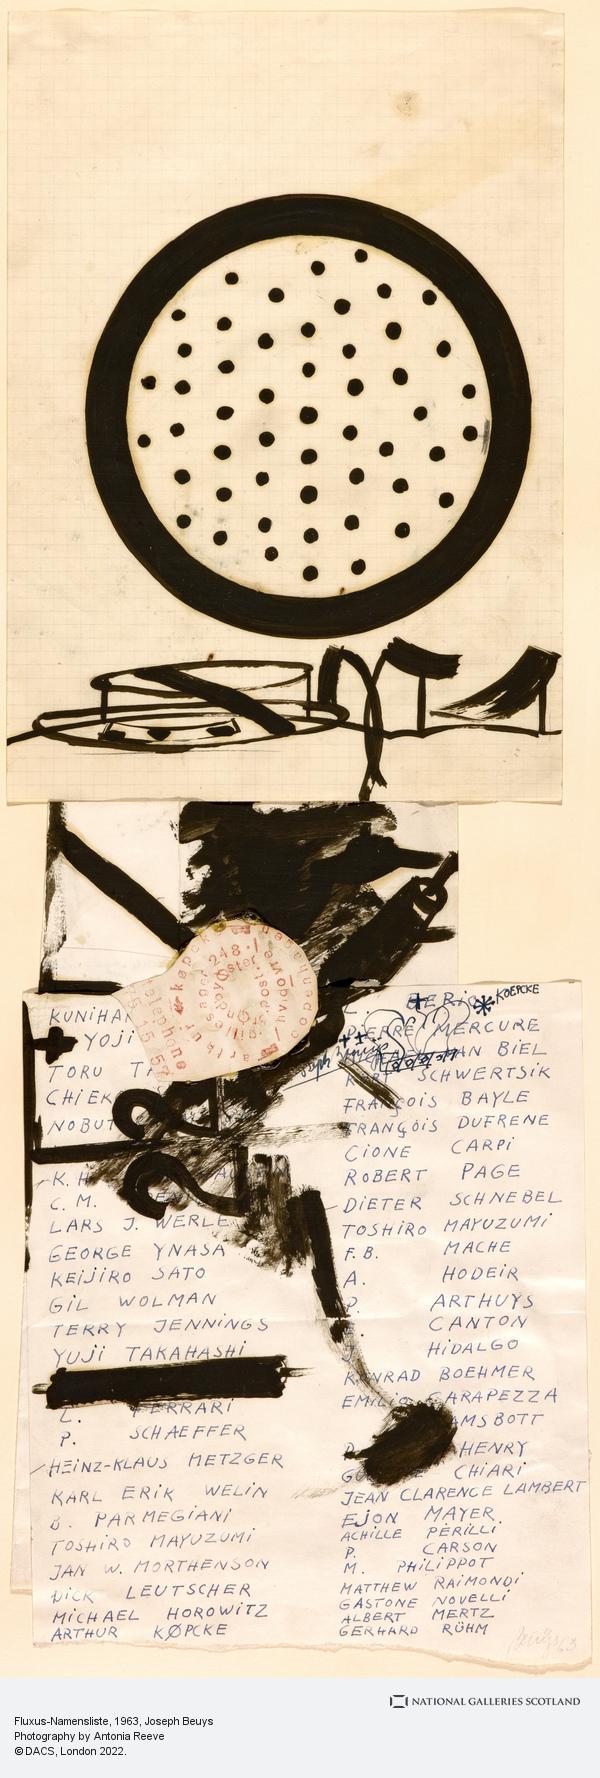 Joseph Beuys, Fluxus-Namensliste